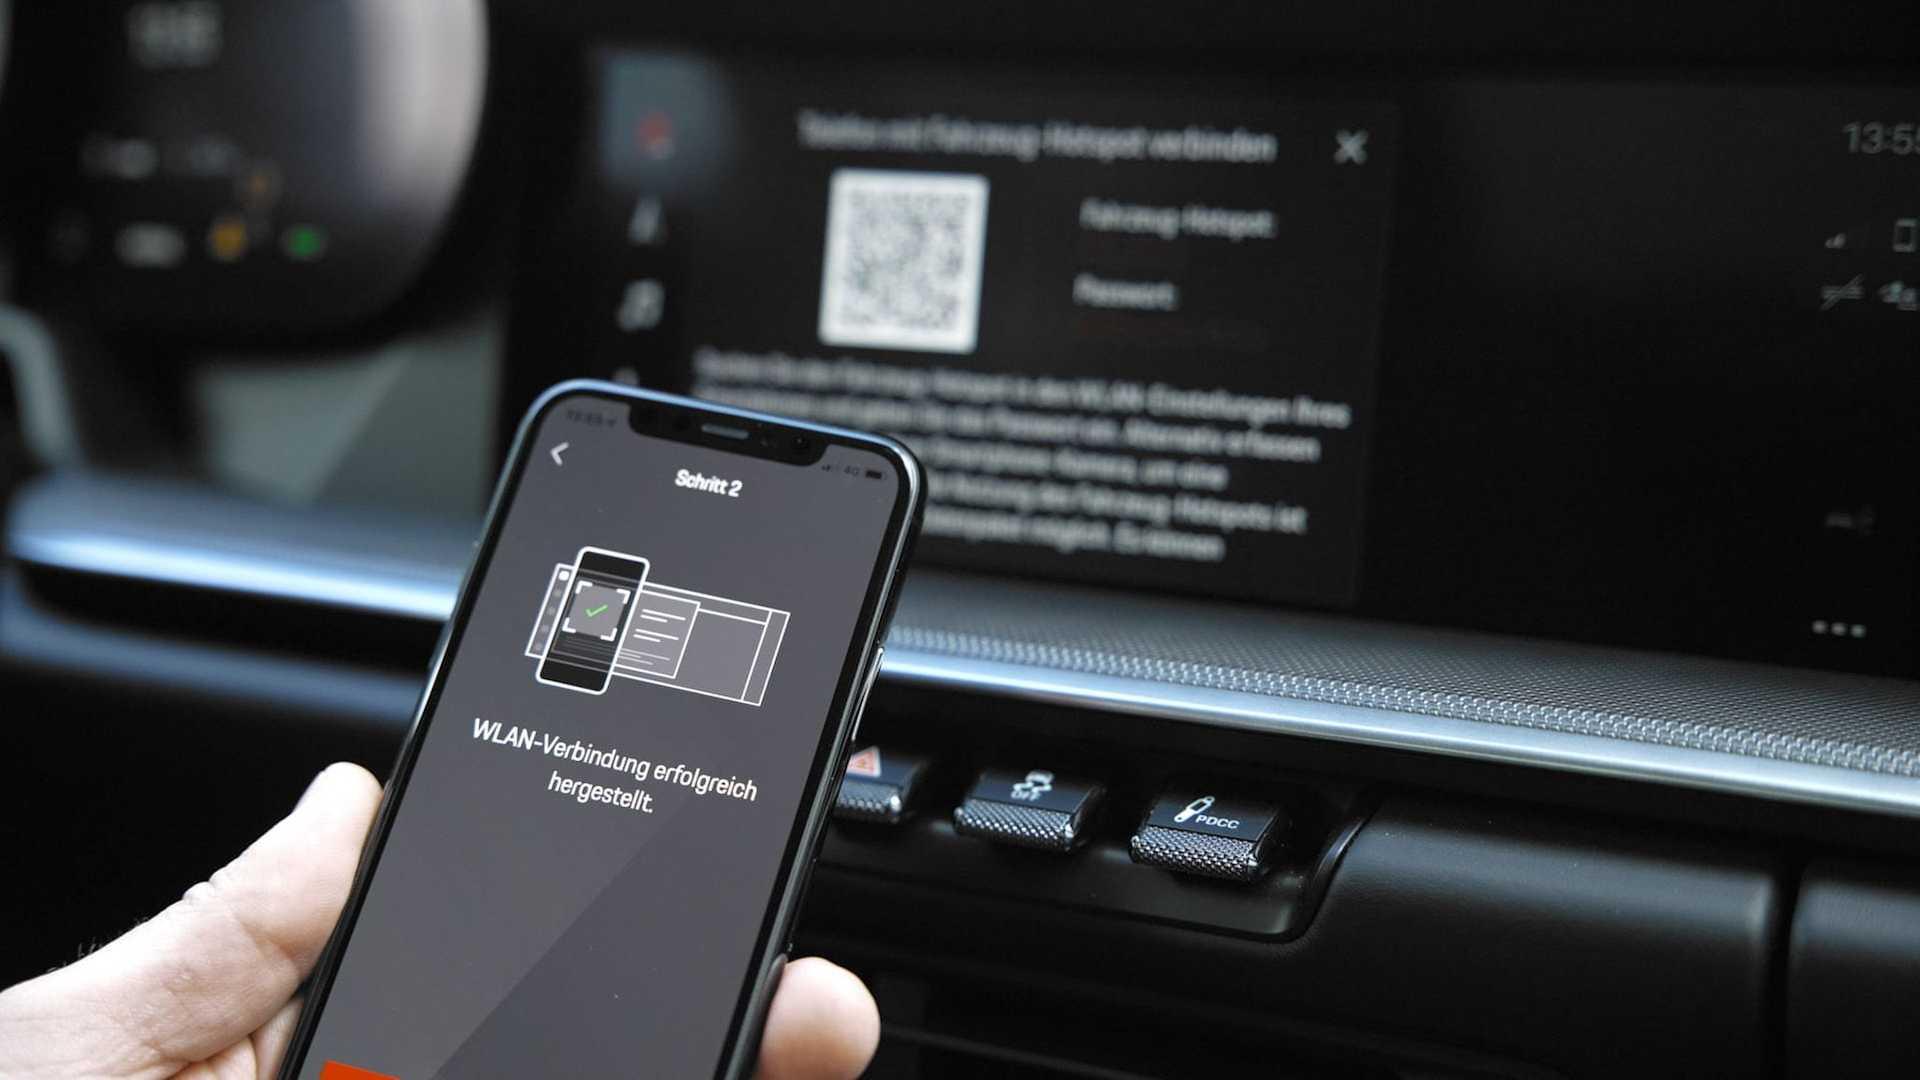 Porsche-Communication-Management-6-29